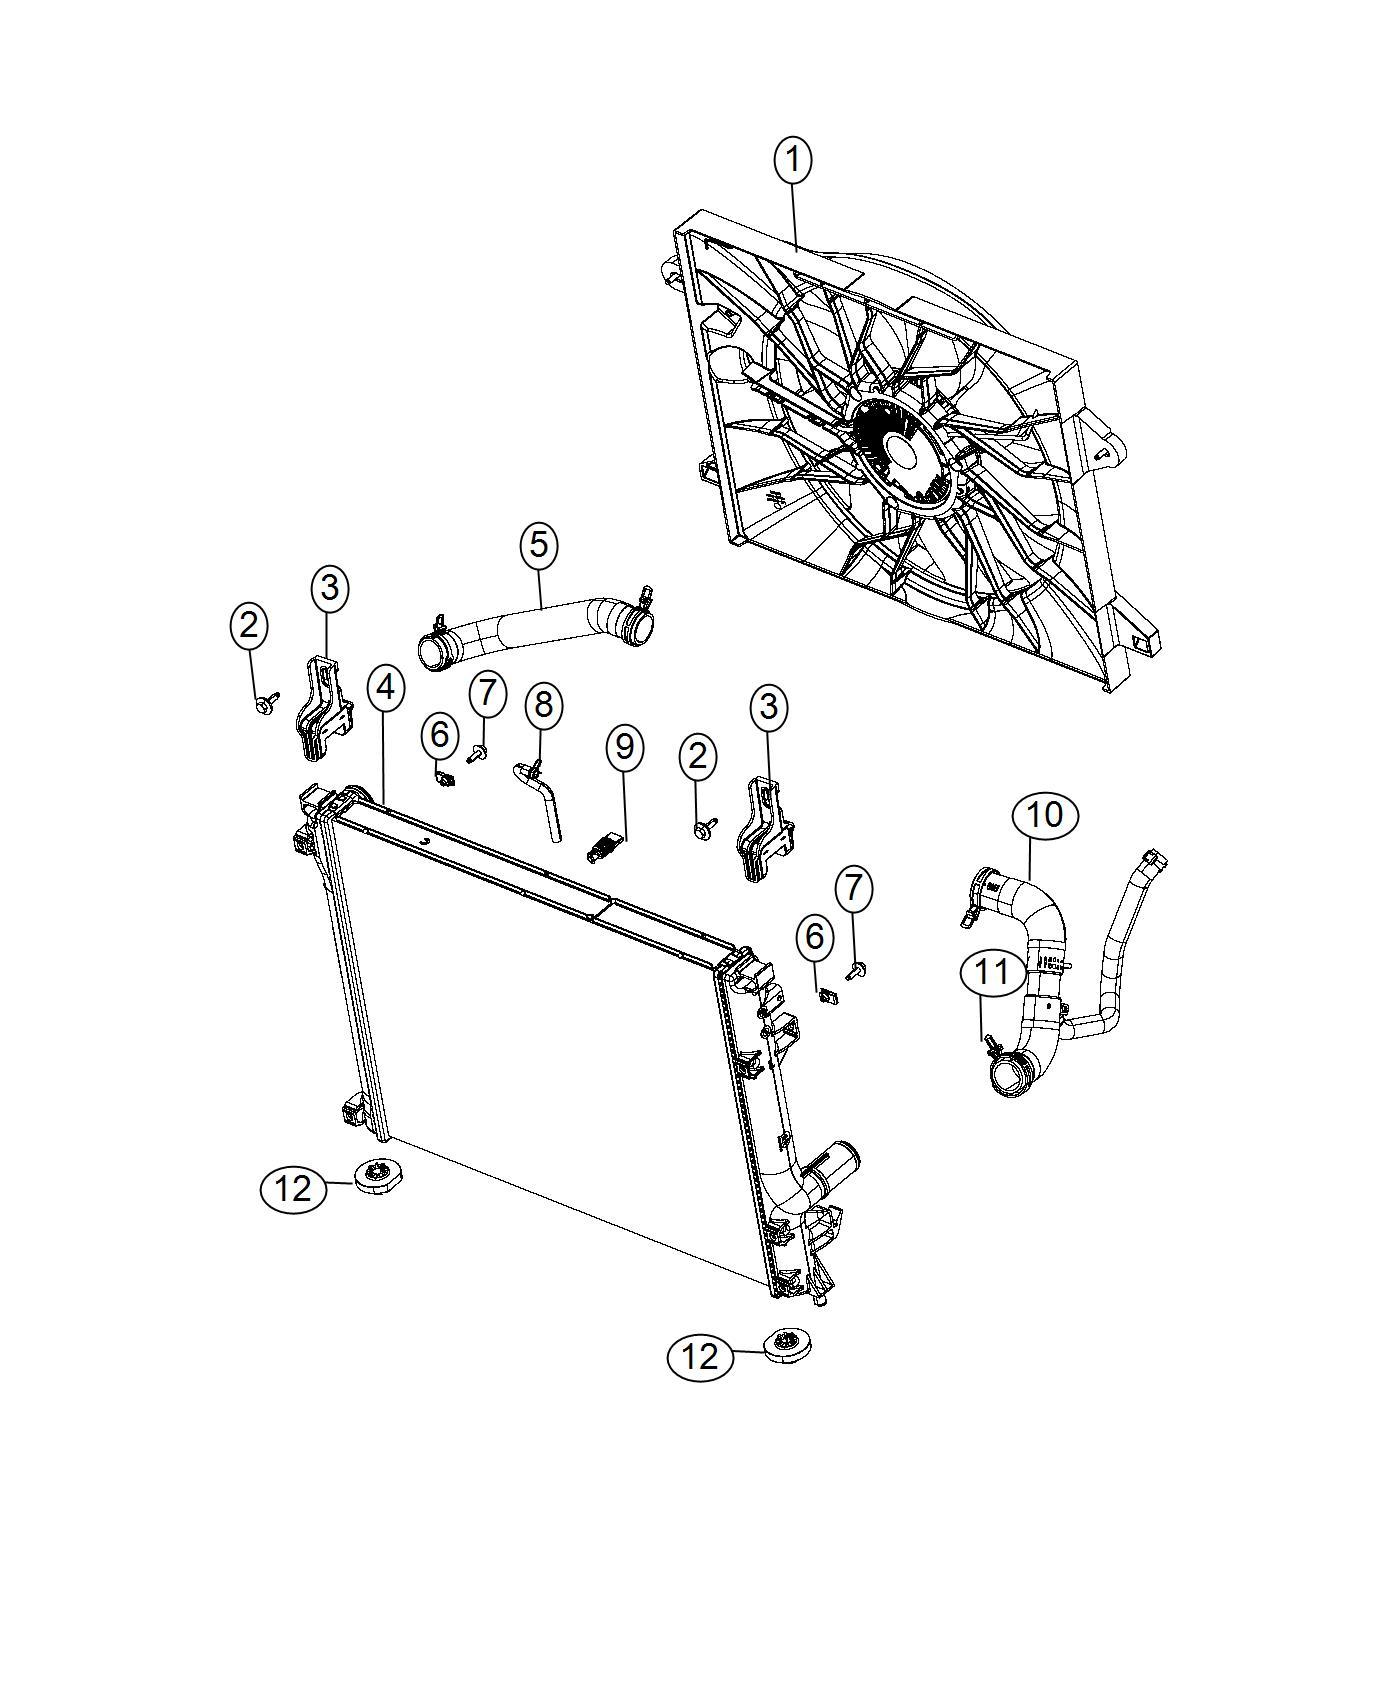 Dodge Challenger Fan Module Radiator Cooling